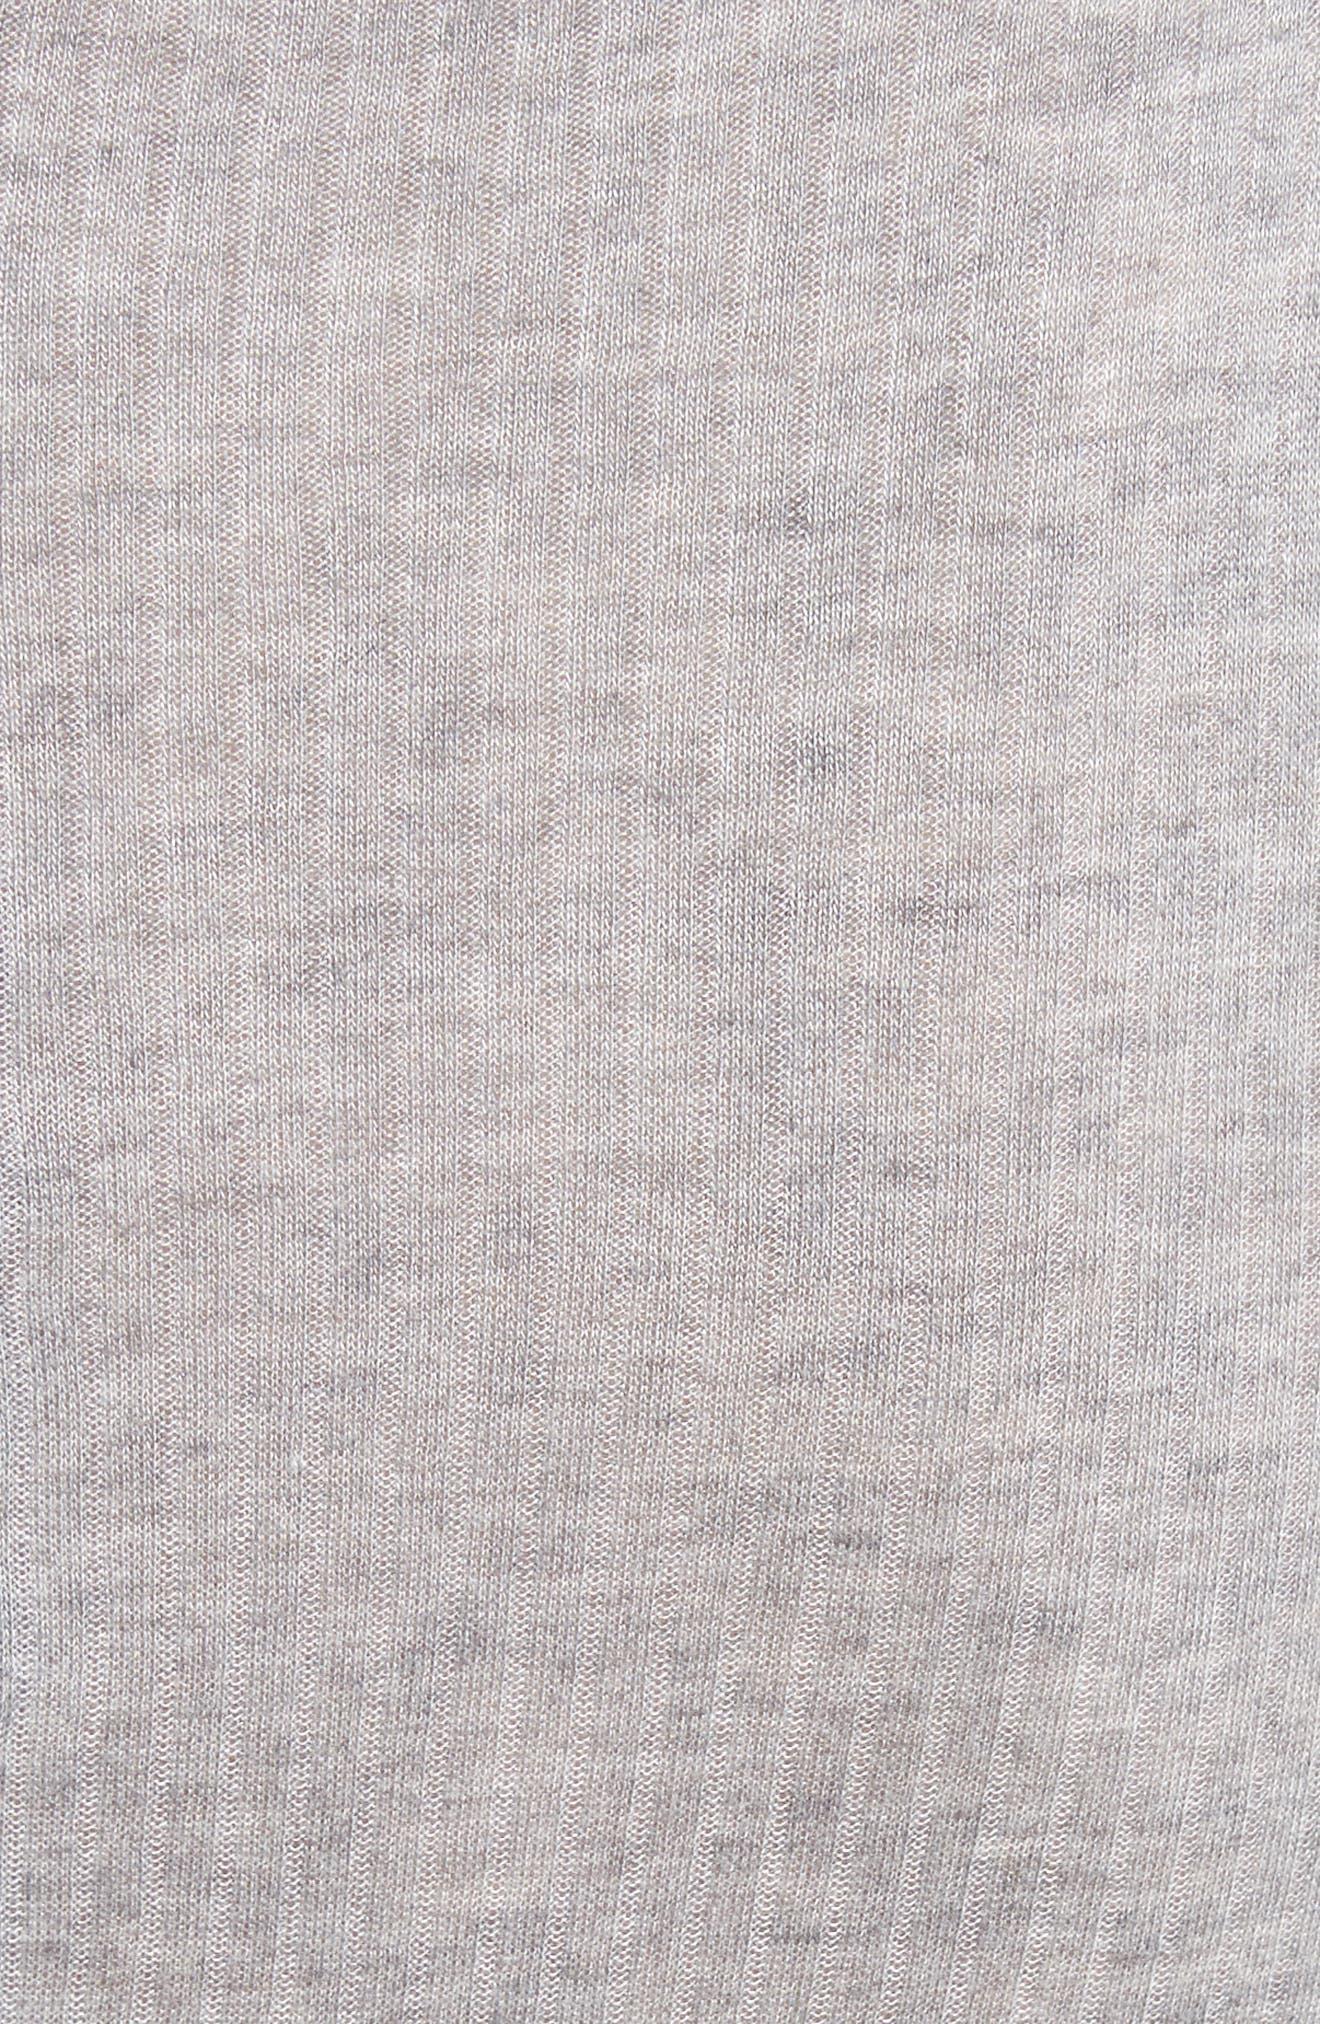 Alternate Image 5  - rag & bone Madison Sleeveless Top